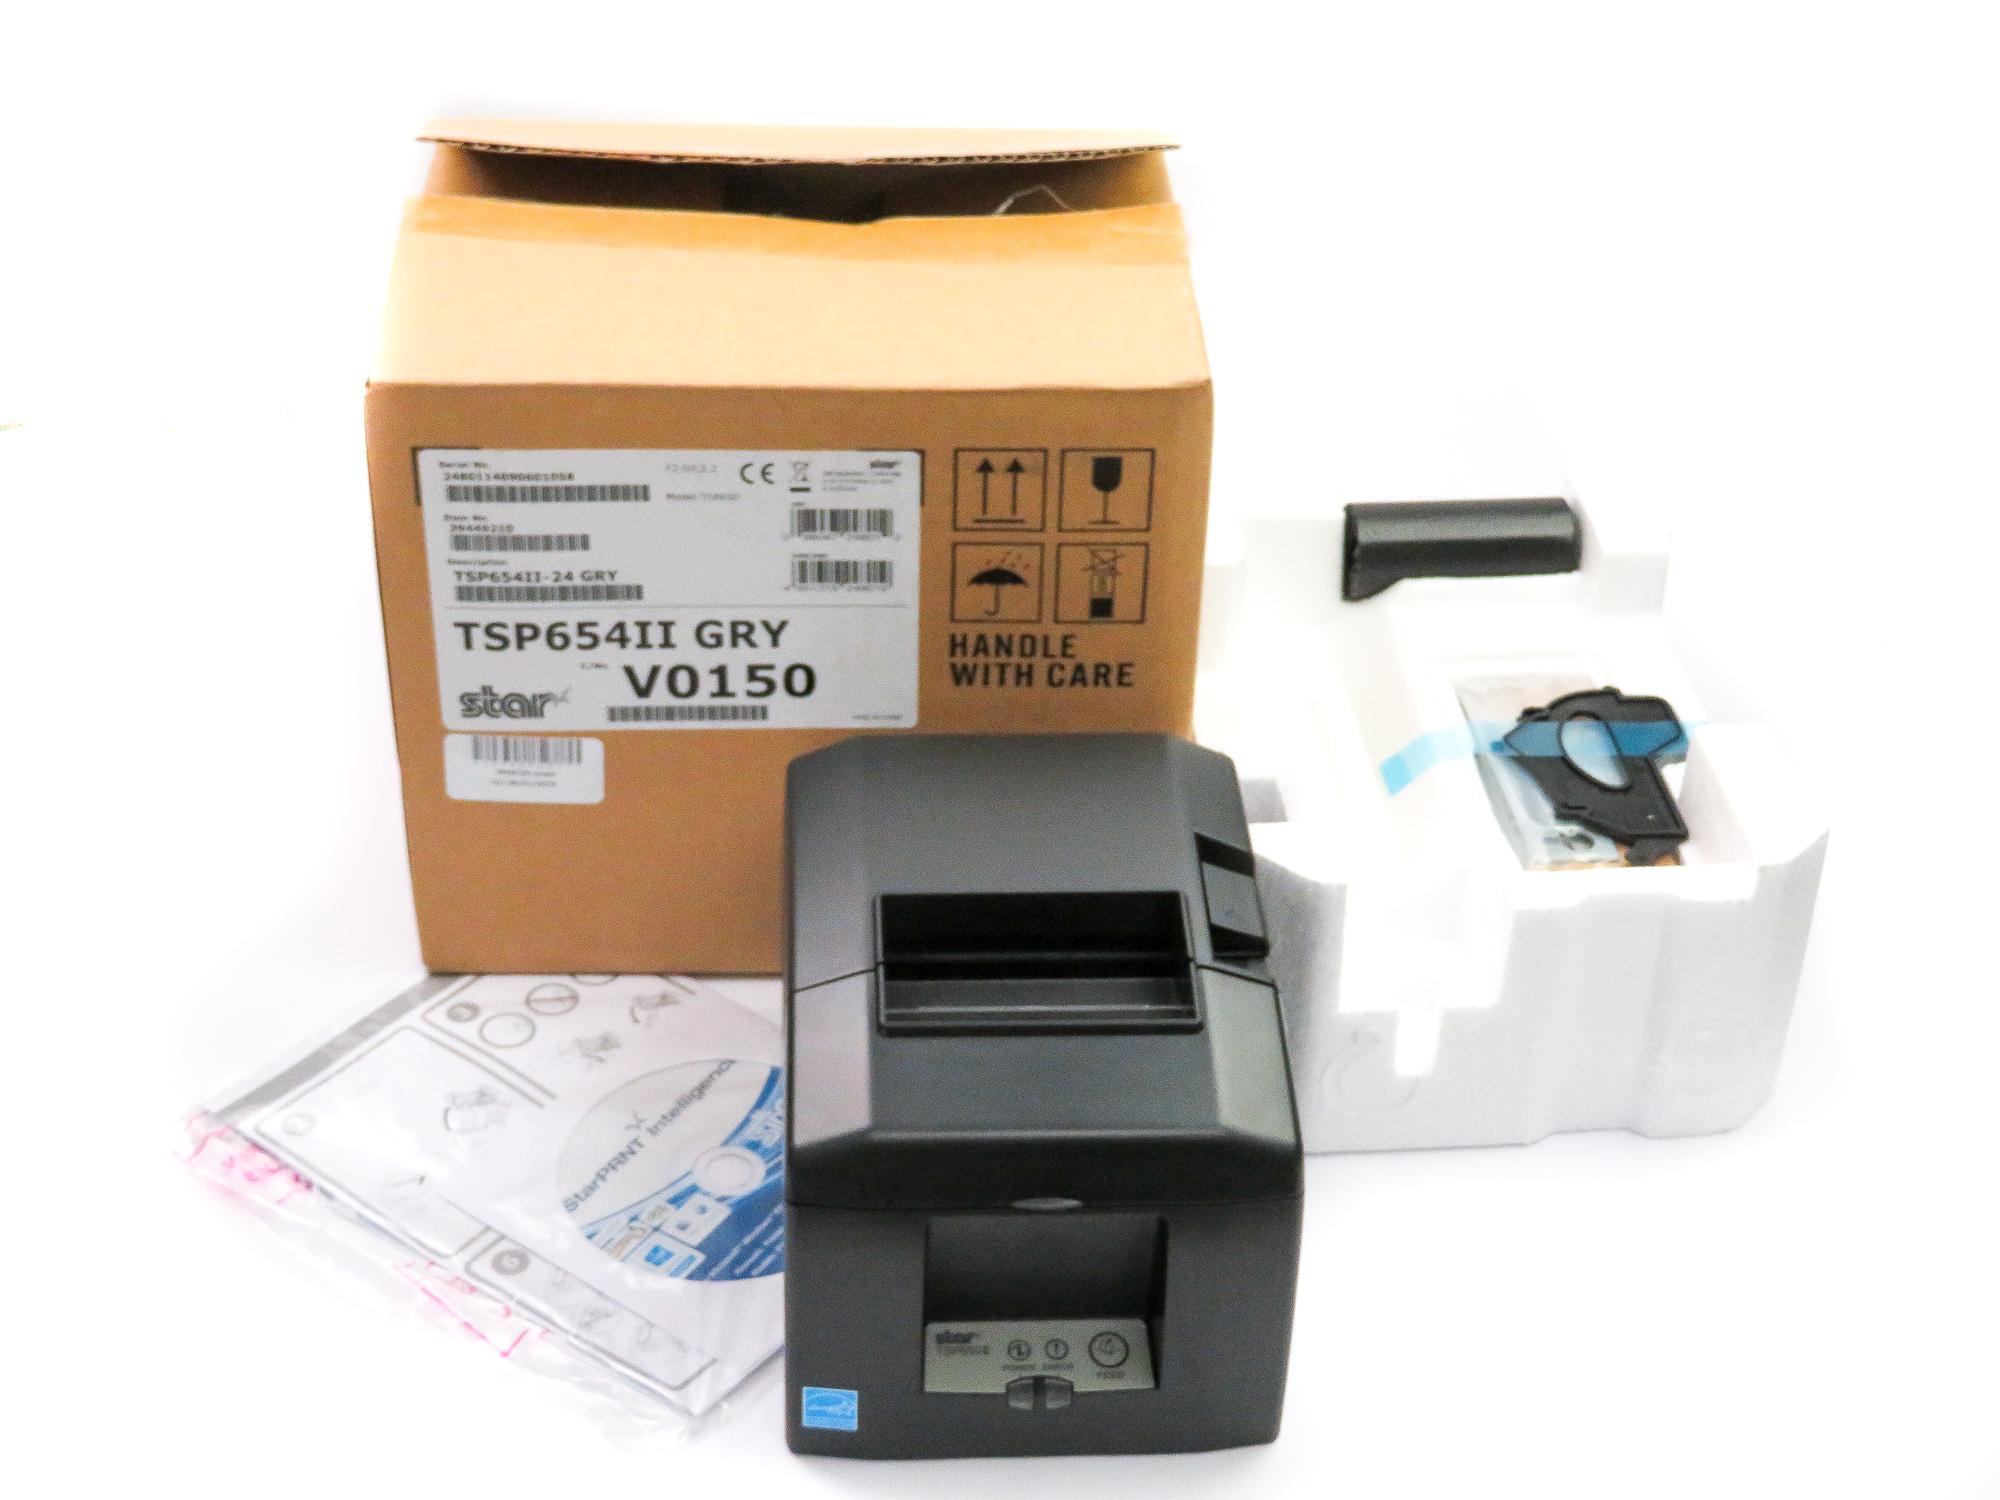 *New* Star TSP650 Thermal ePOS Receipt Printer (w/o Interface)- TSP654II-24 GRY